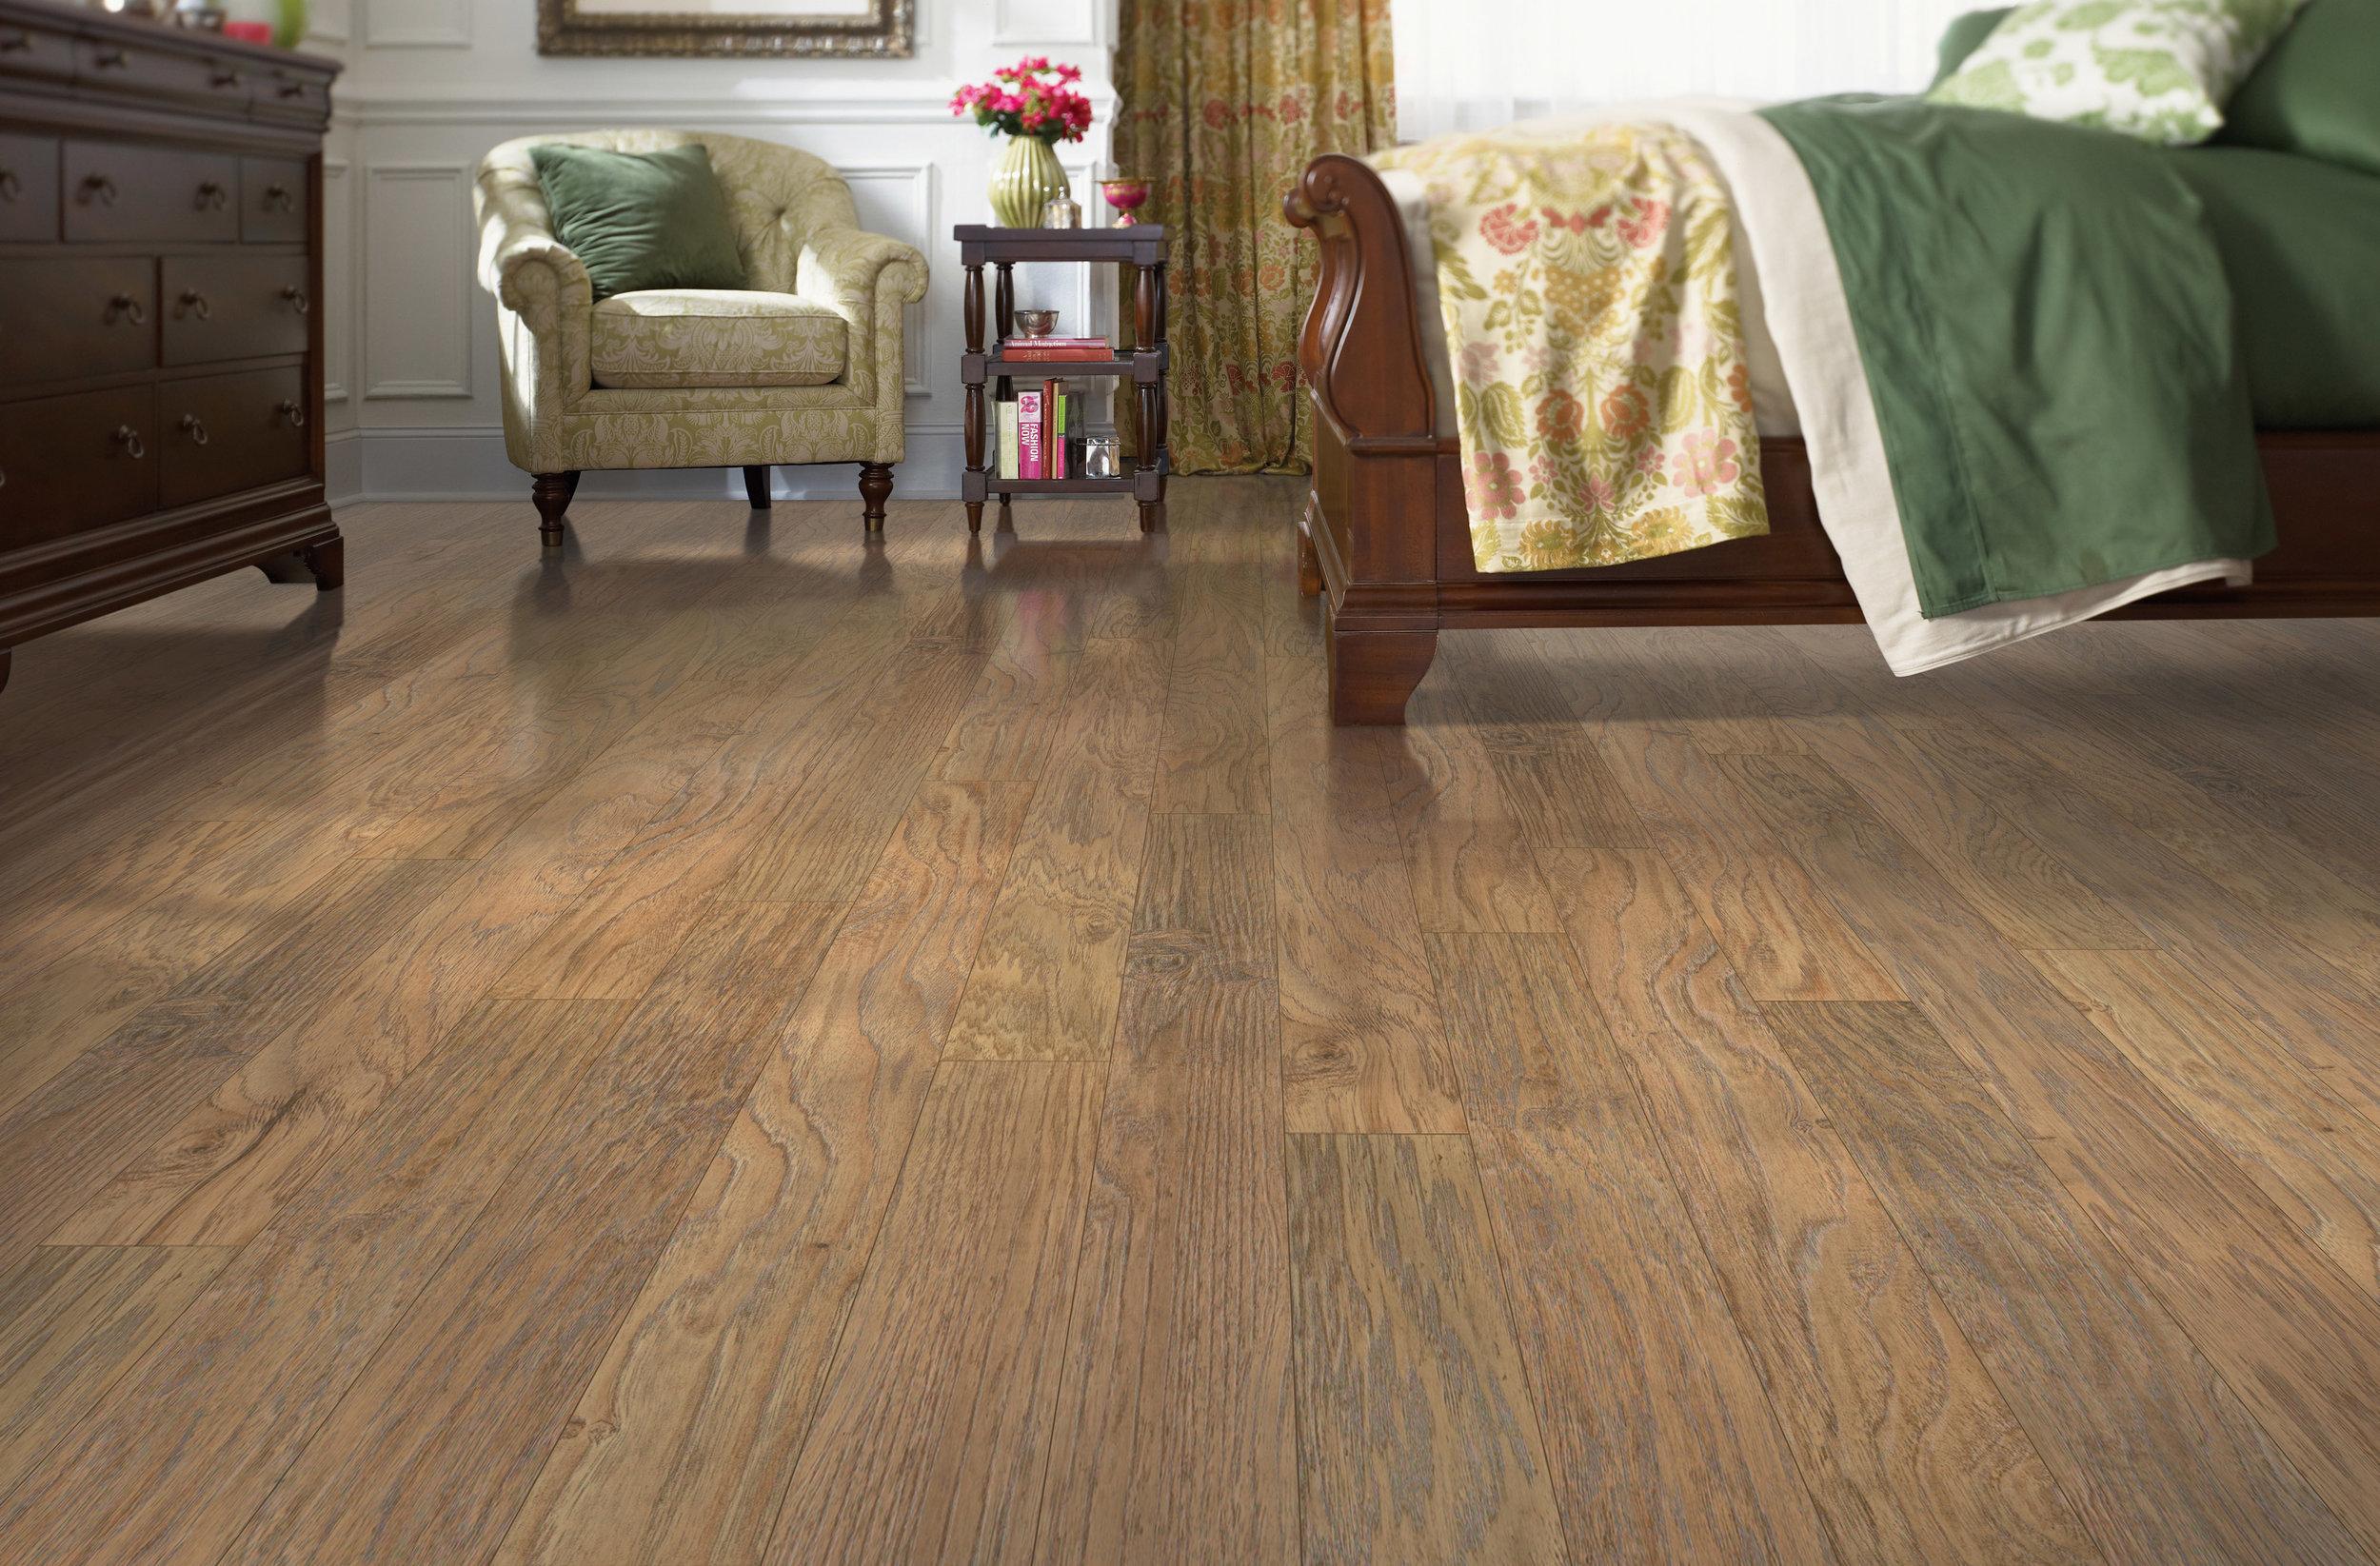 Luxury Vinyl Tile LVT Flooring by Divine hardwood & stone Portland